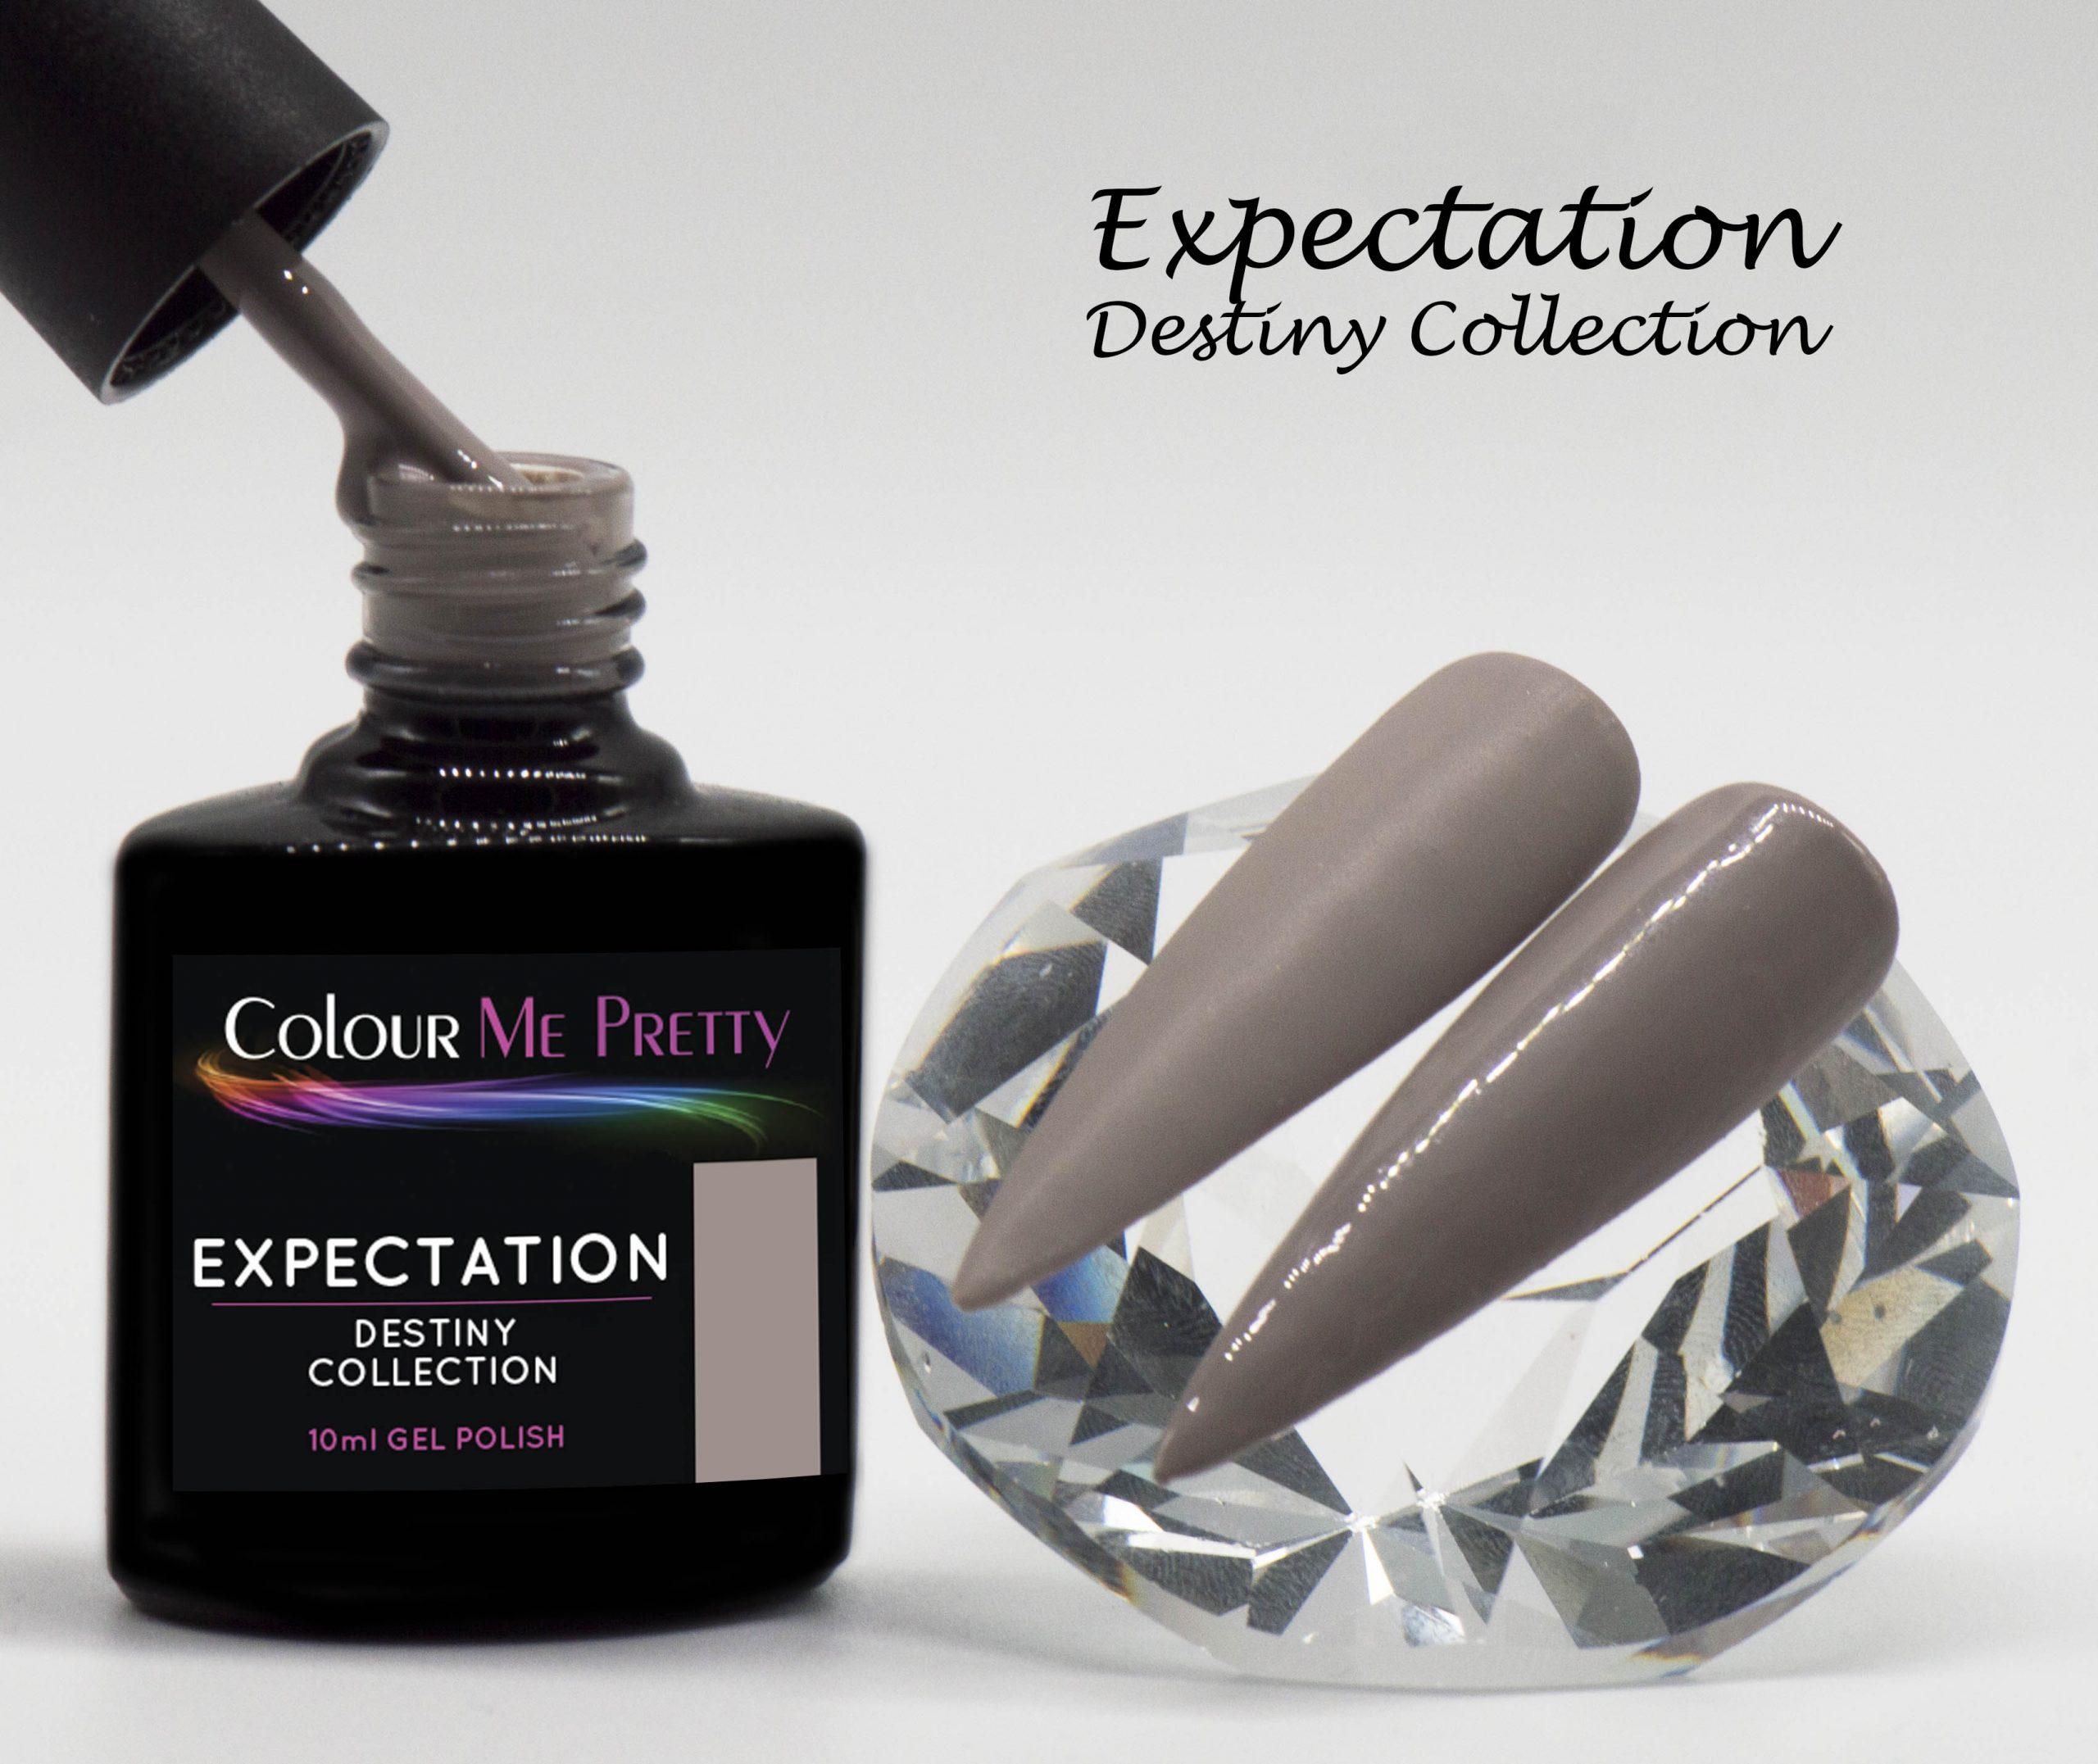 Destiny Expectation